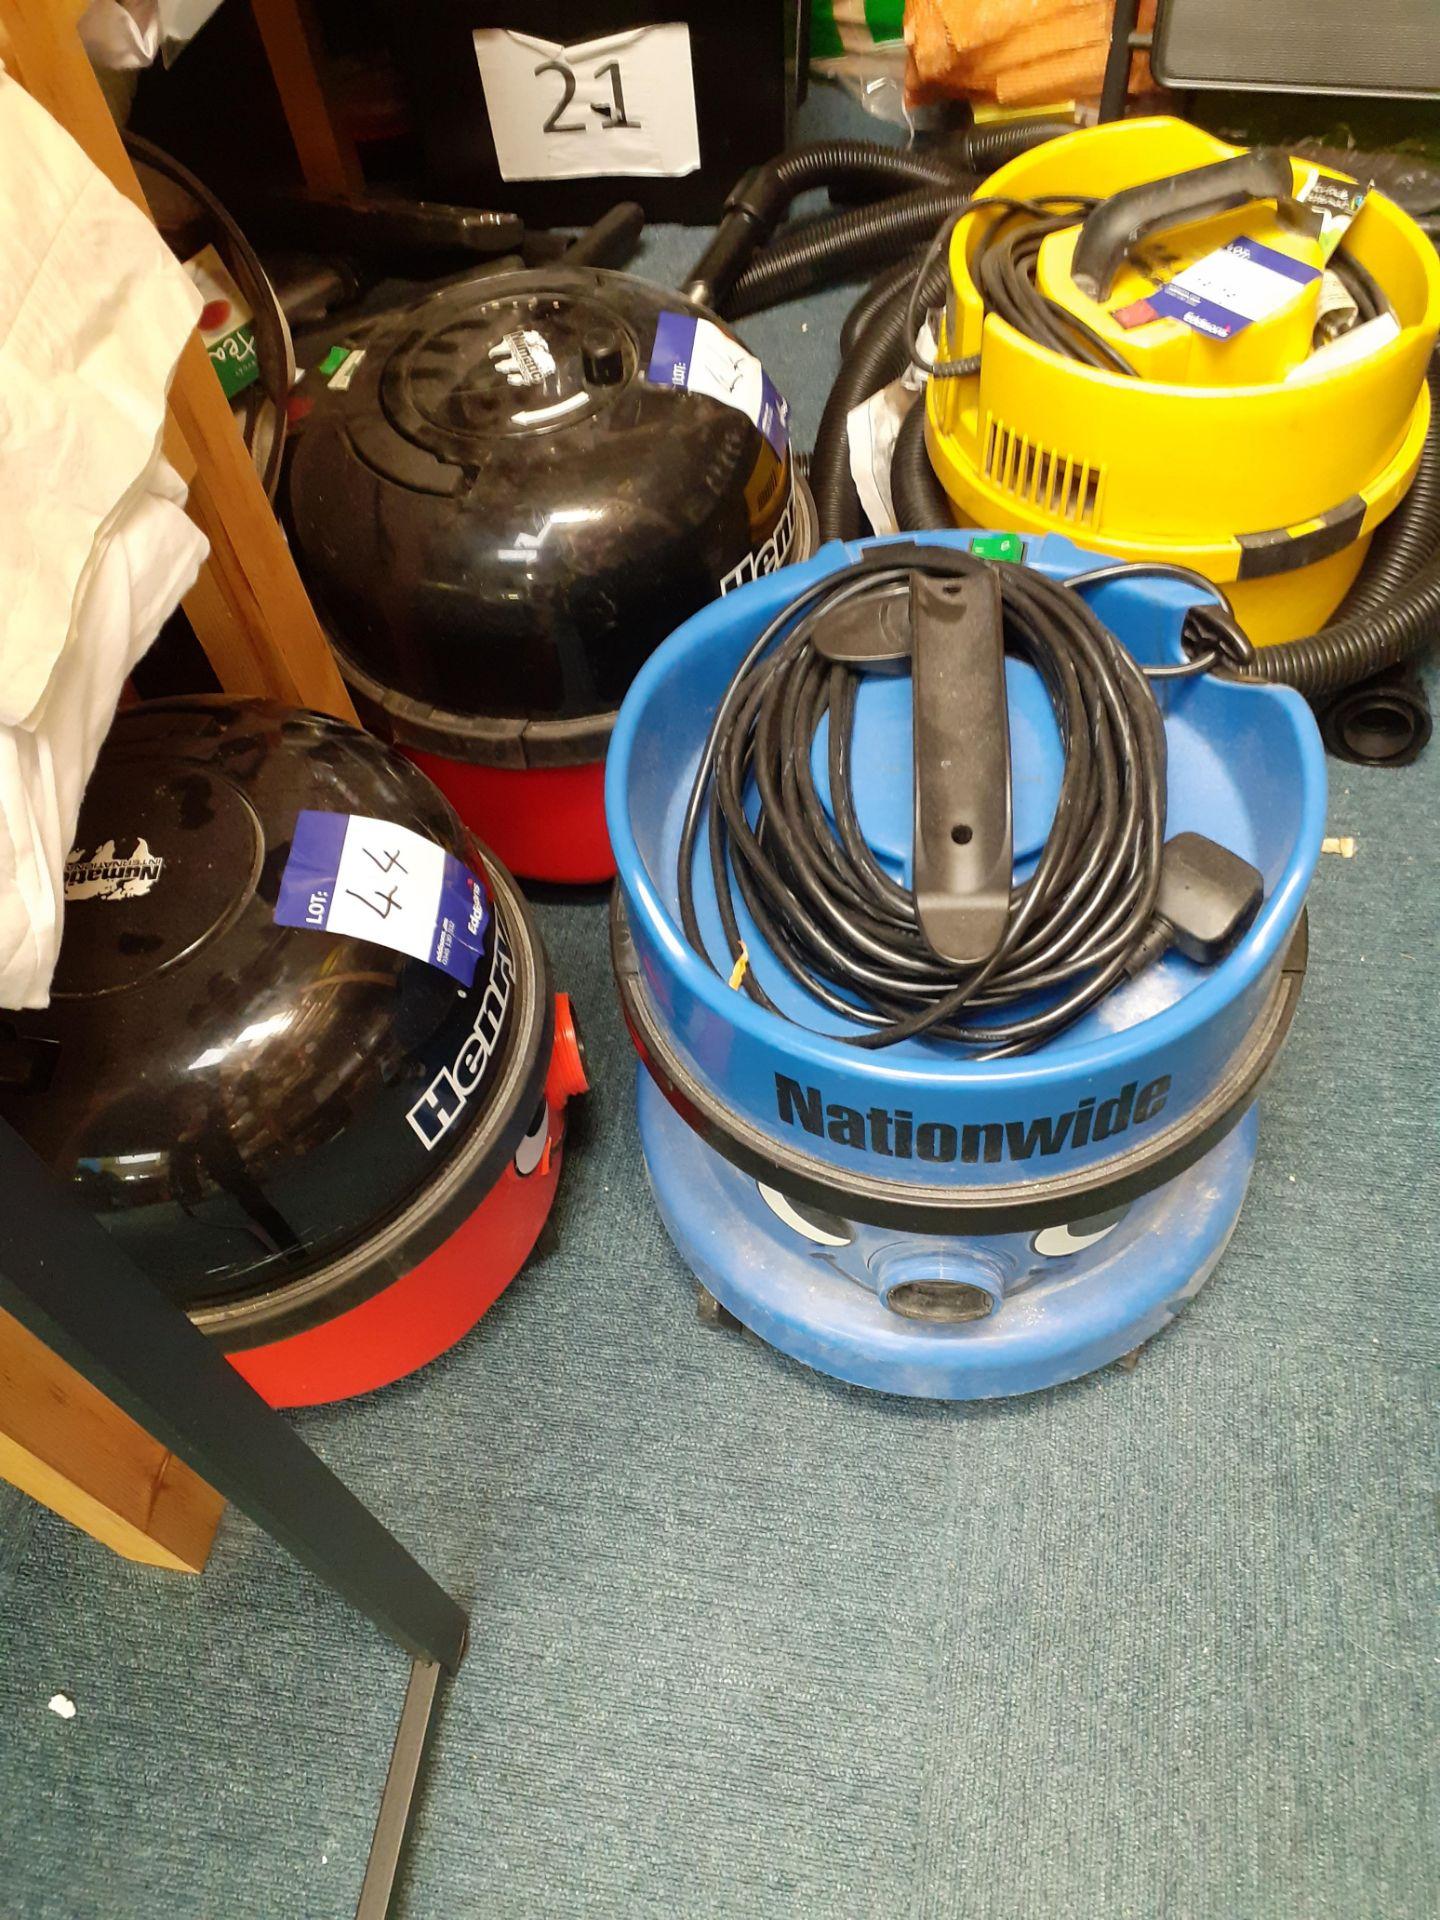 2 Numatic Henry Vacuum Cleaners, Numatic JVP-1801 - Image 3 of 3